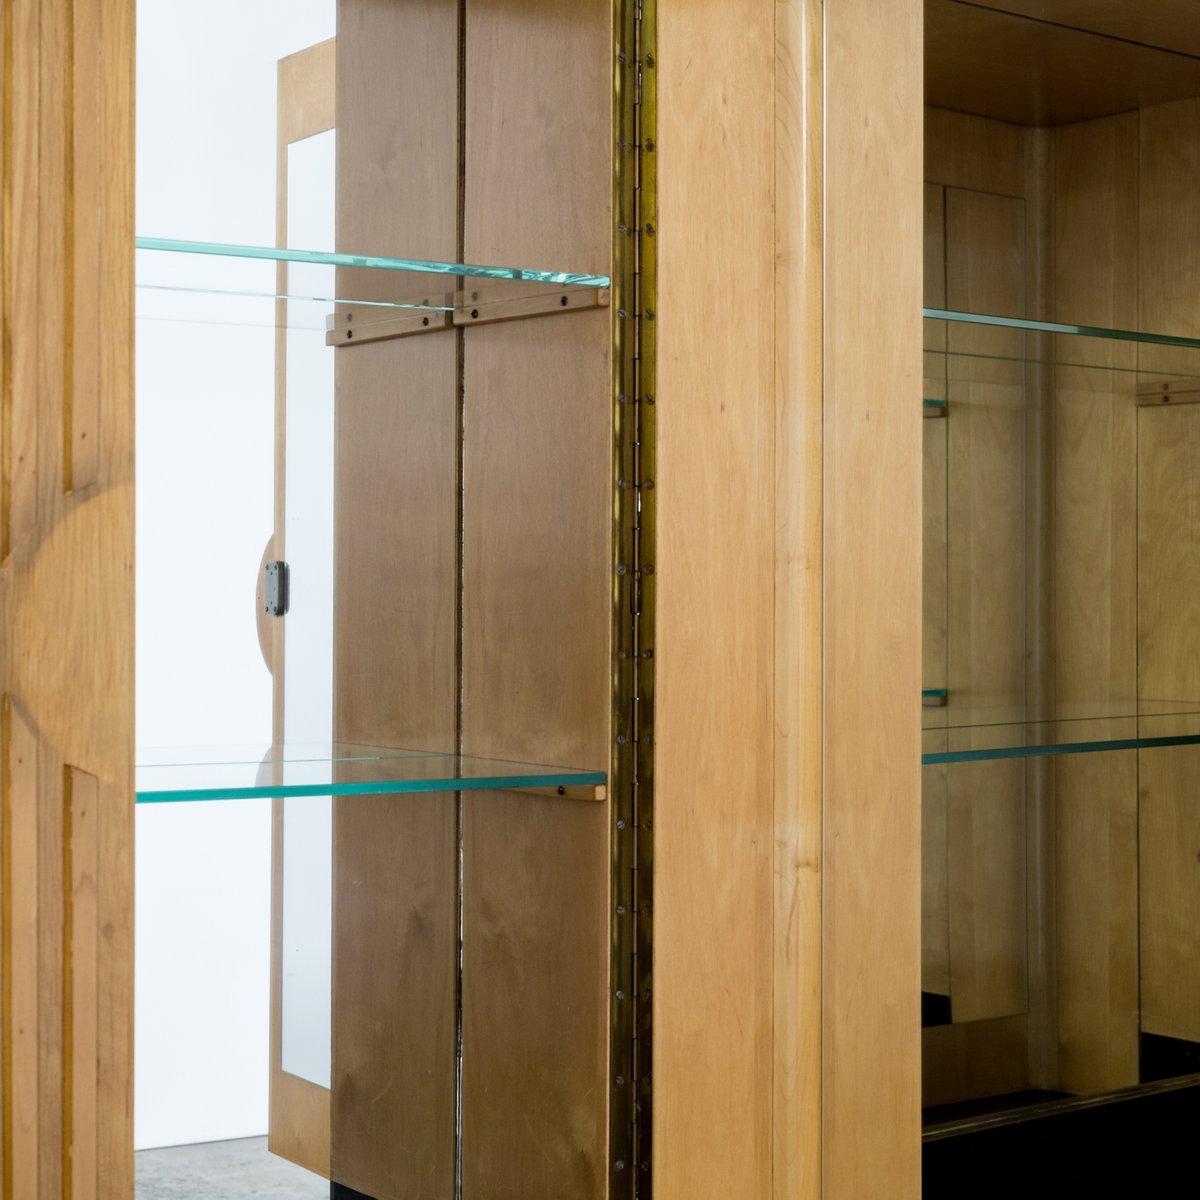 Art Deco Kitchen Cabinets: Art Deco Cabinet, 1930s For Sale At Pamono